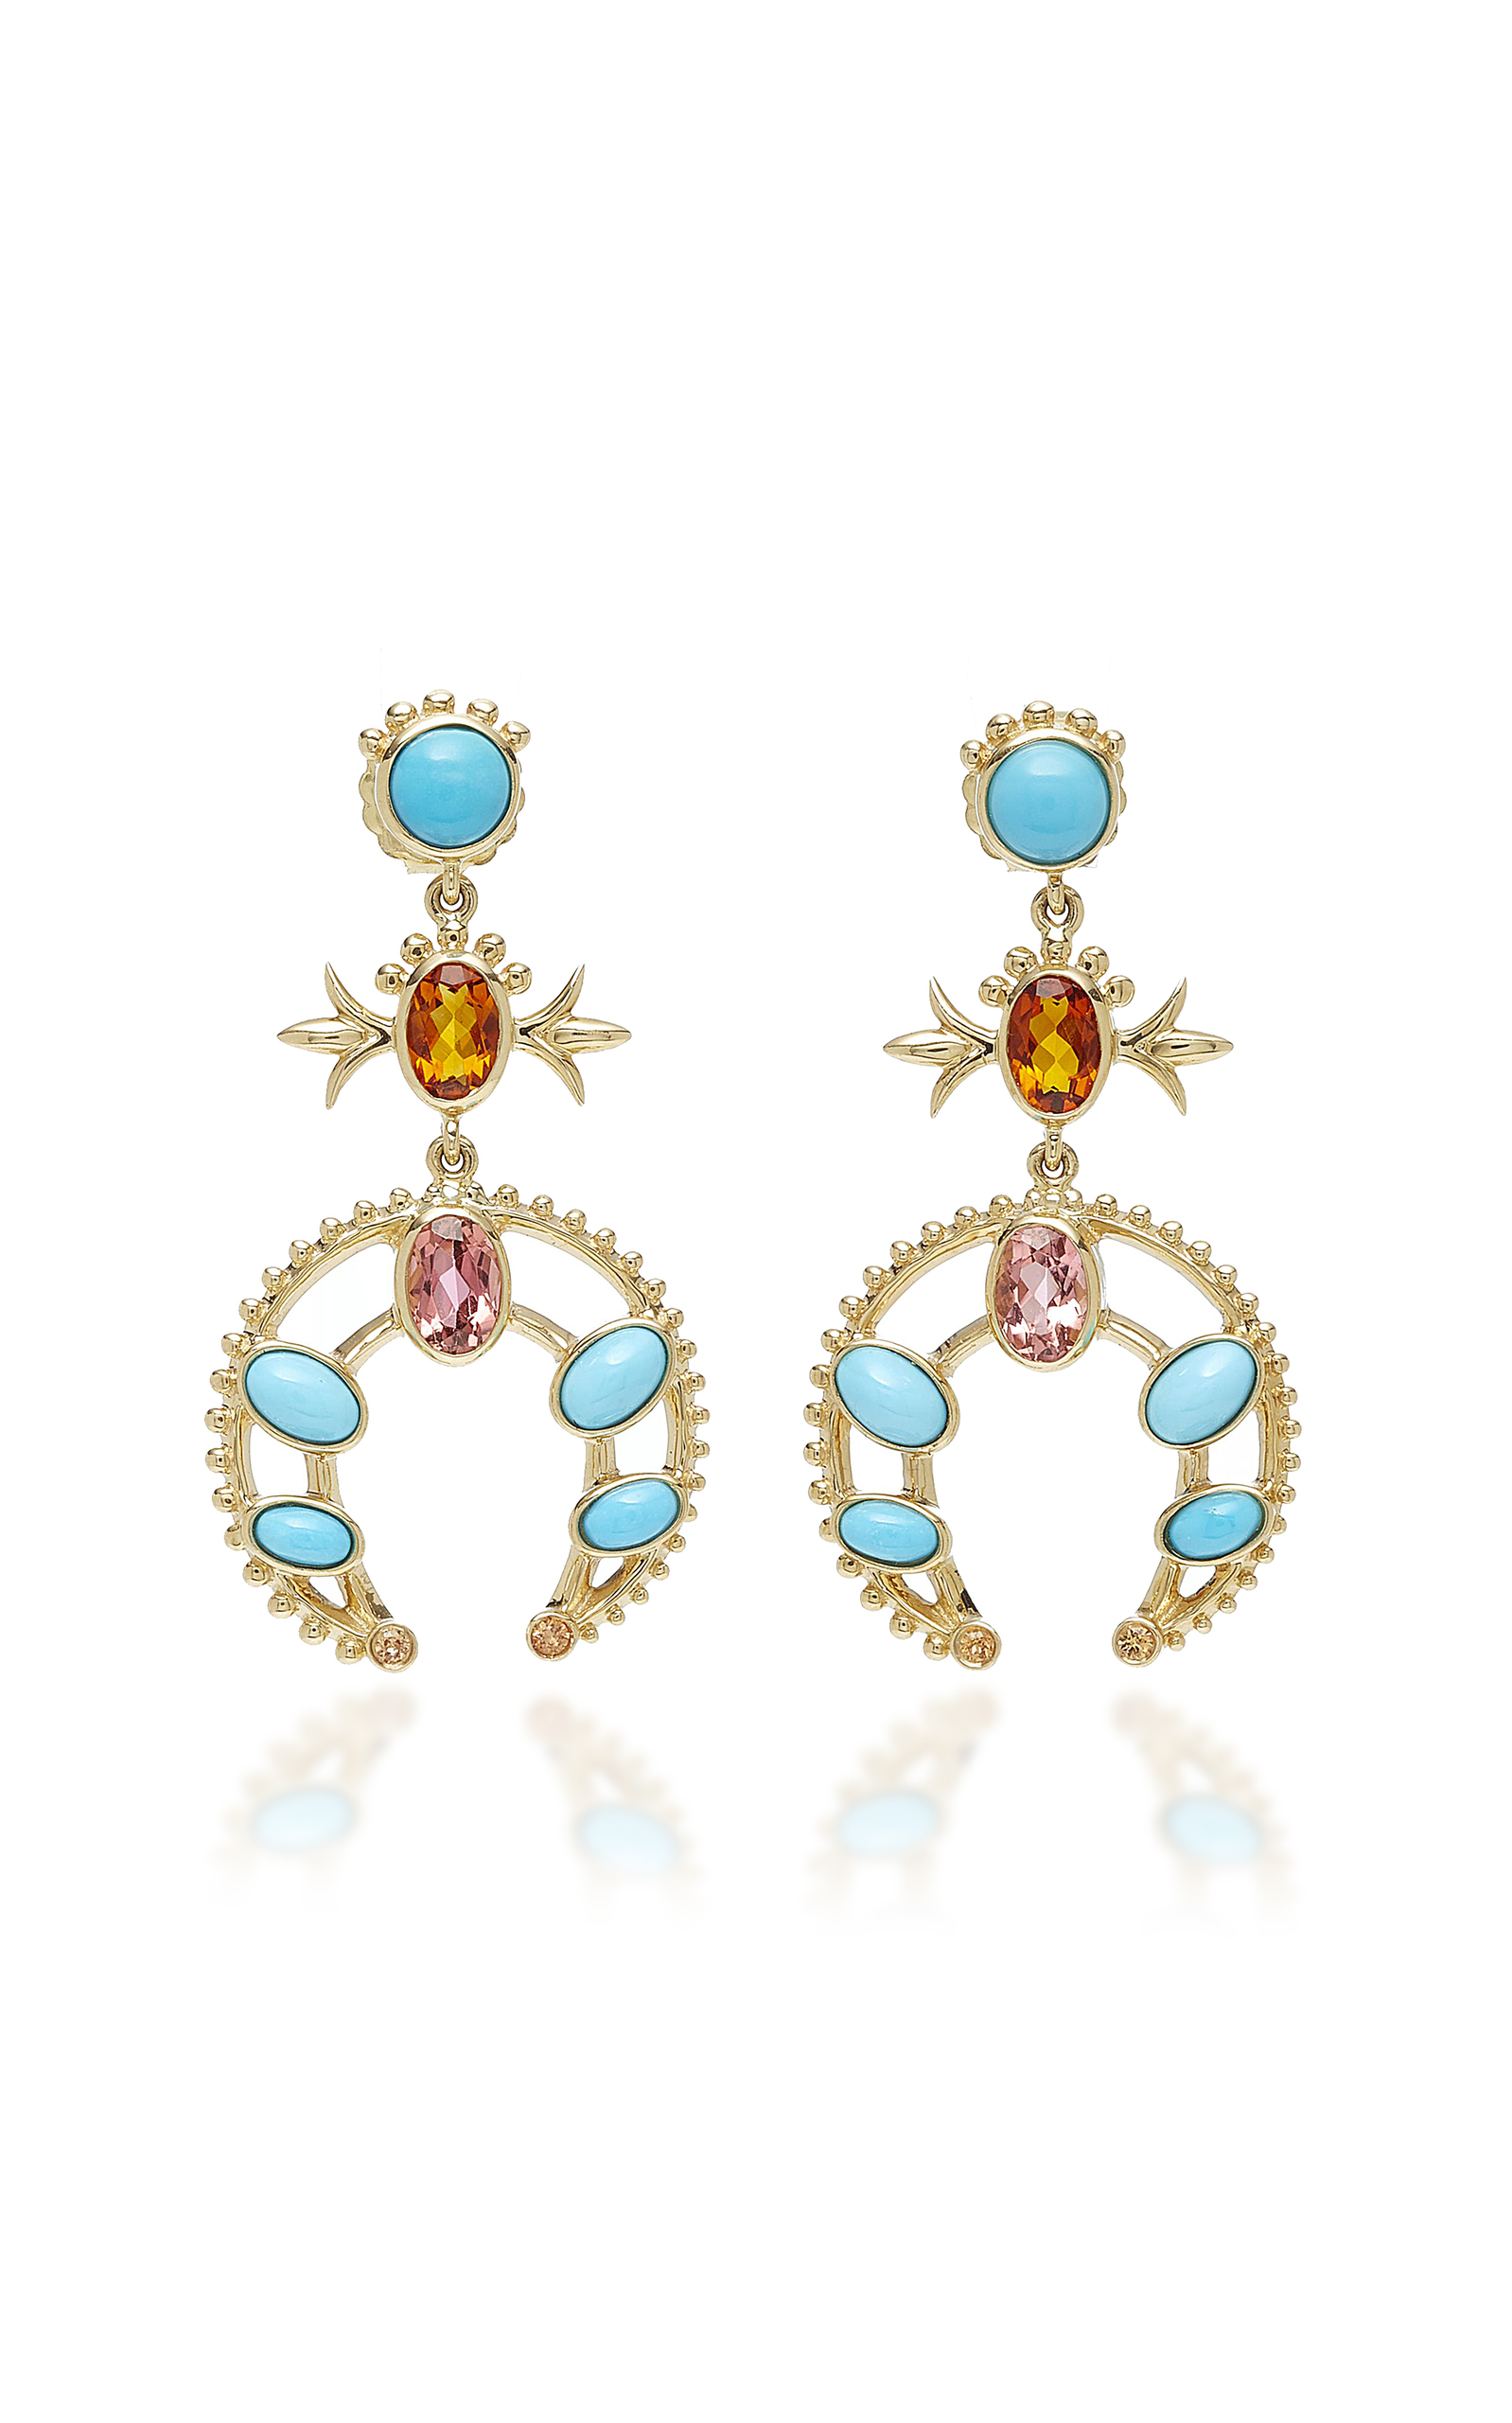 Women's Squash Blossom Earrings